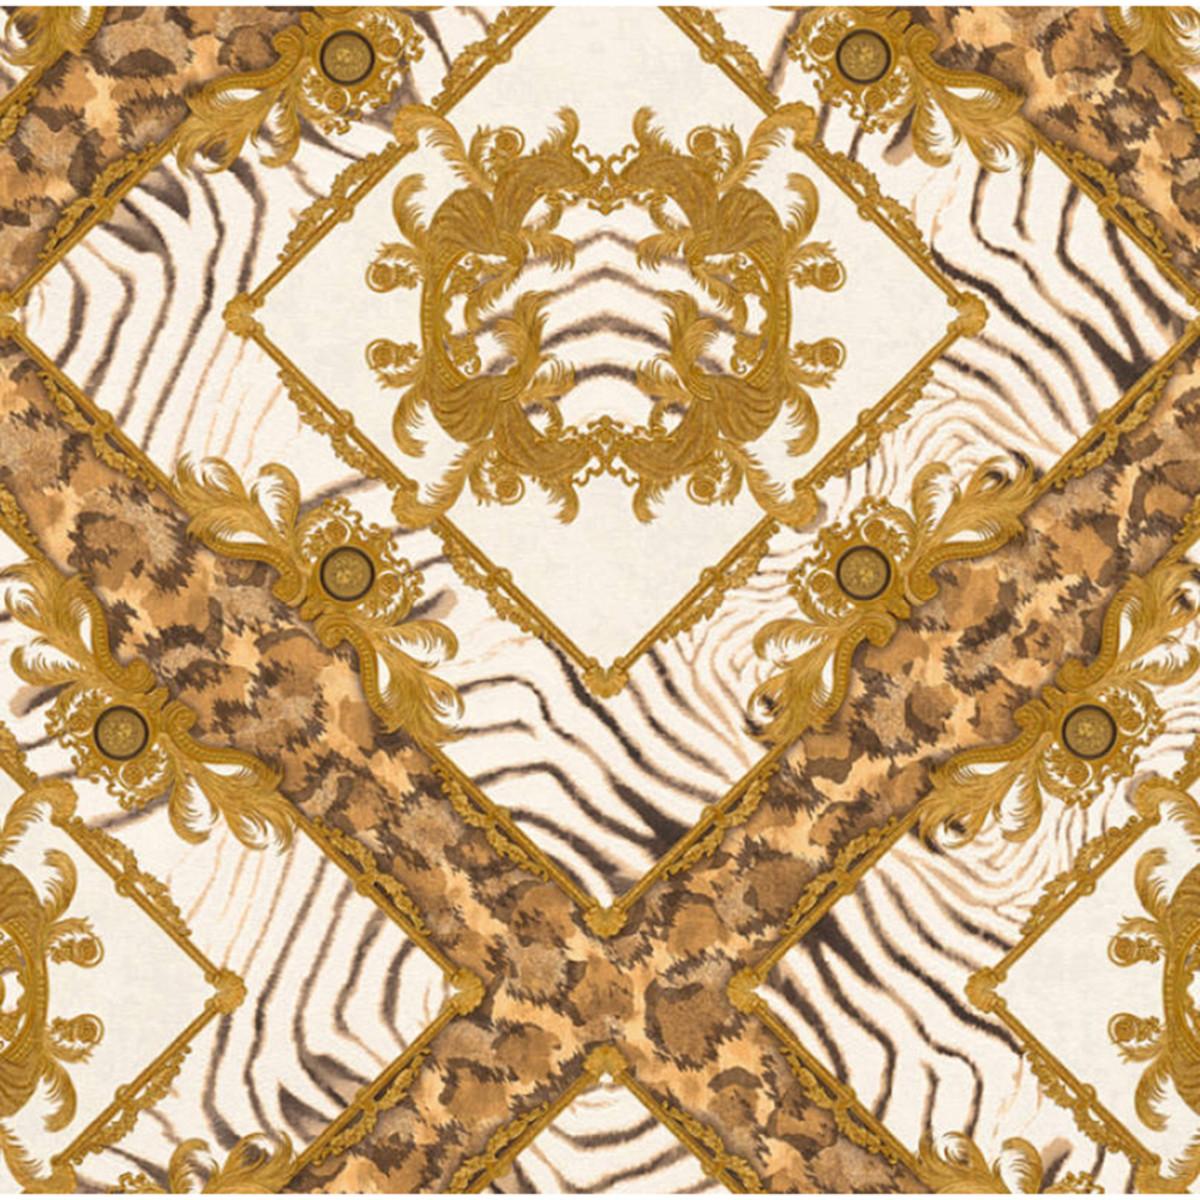 Обои флизелиновые A.S. Creation Versace III бежевые 0.53 м 34904-3